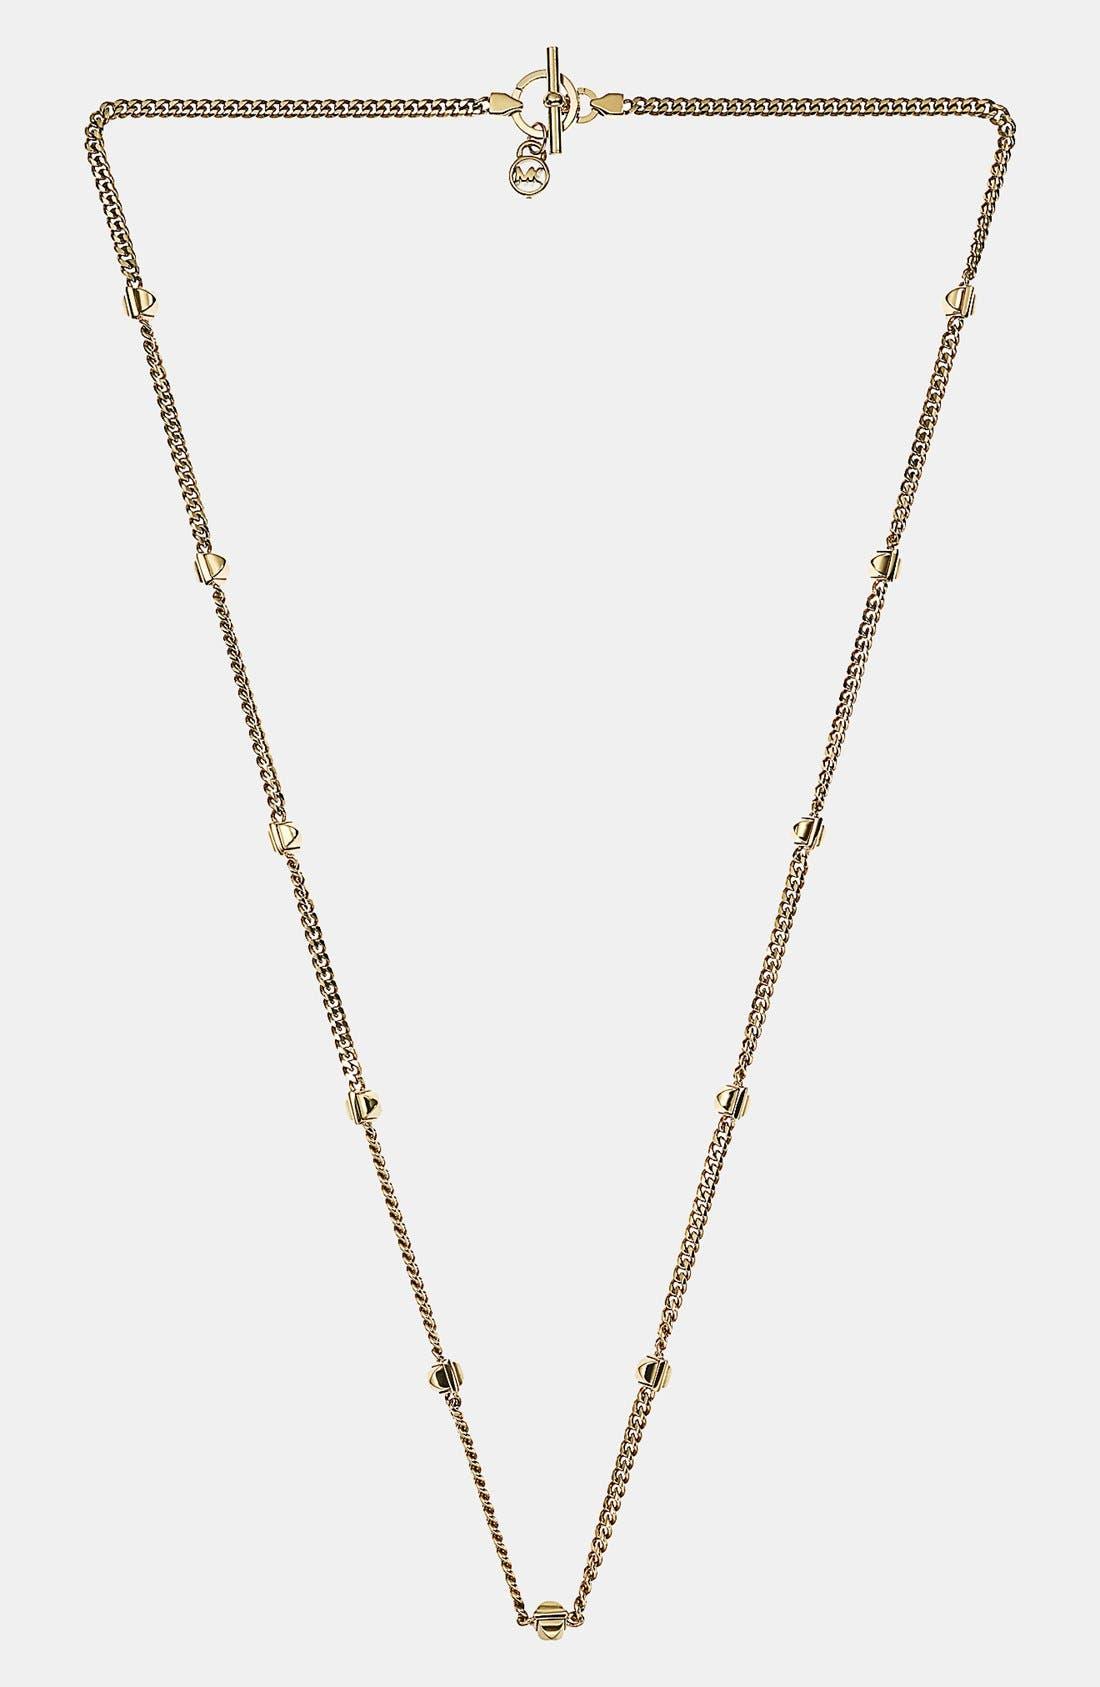 Alternate Image 1 Selected - Michael Kors 'Glam Rock' Long Station Necklace